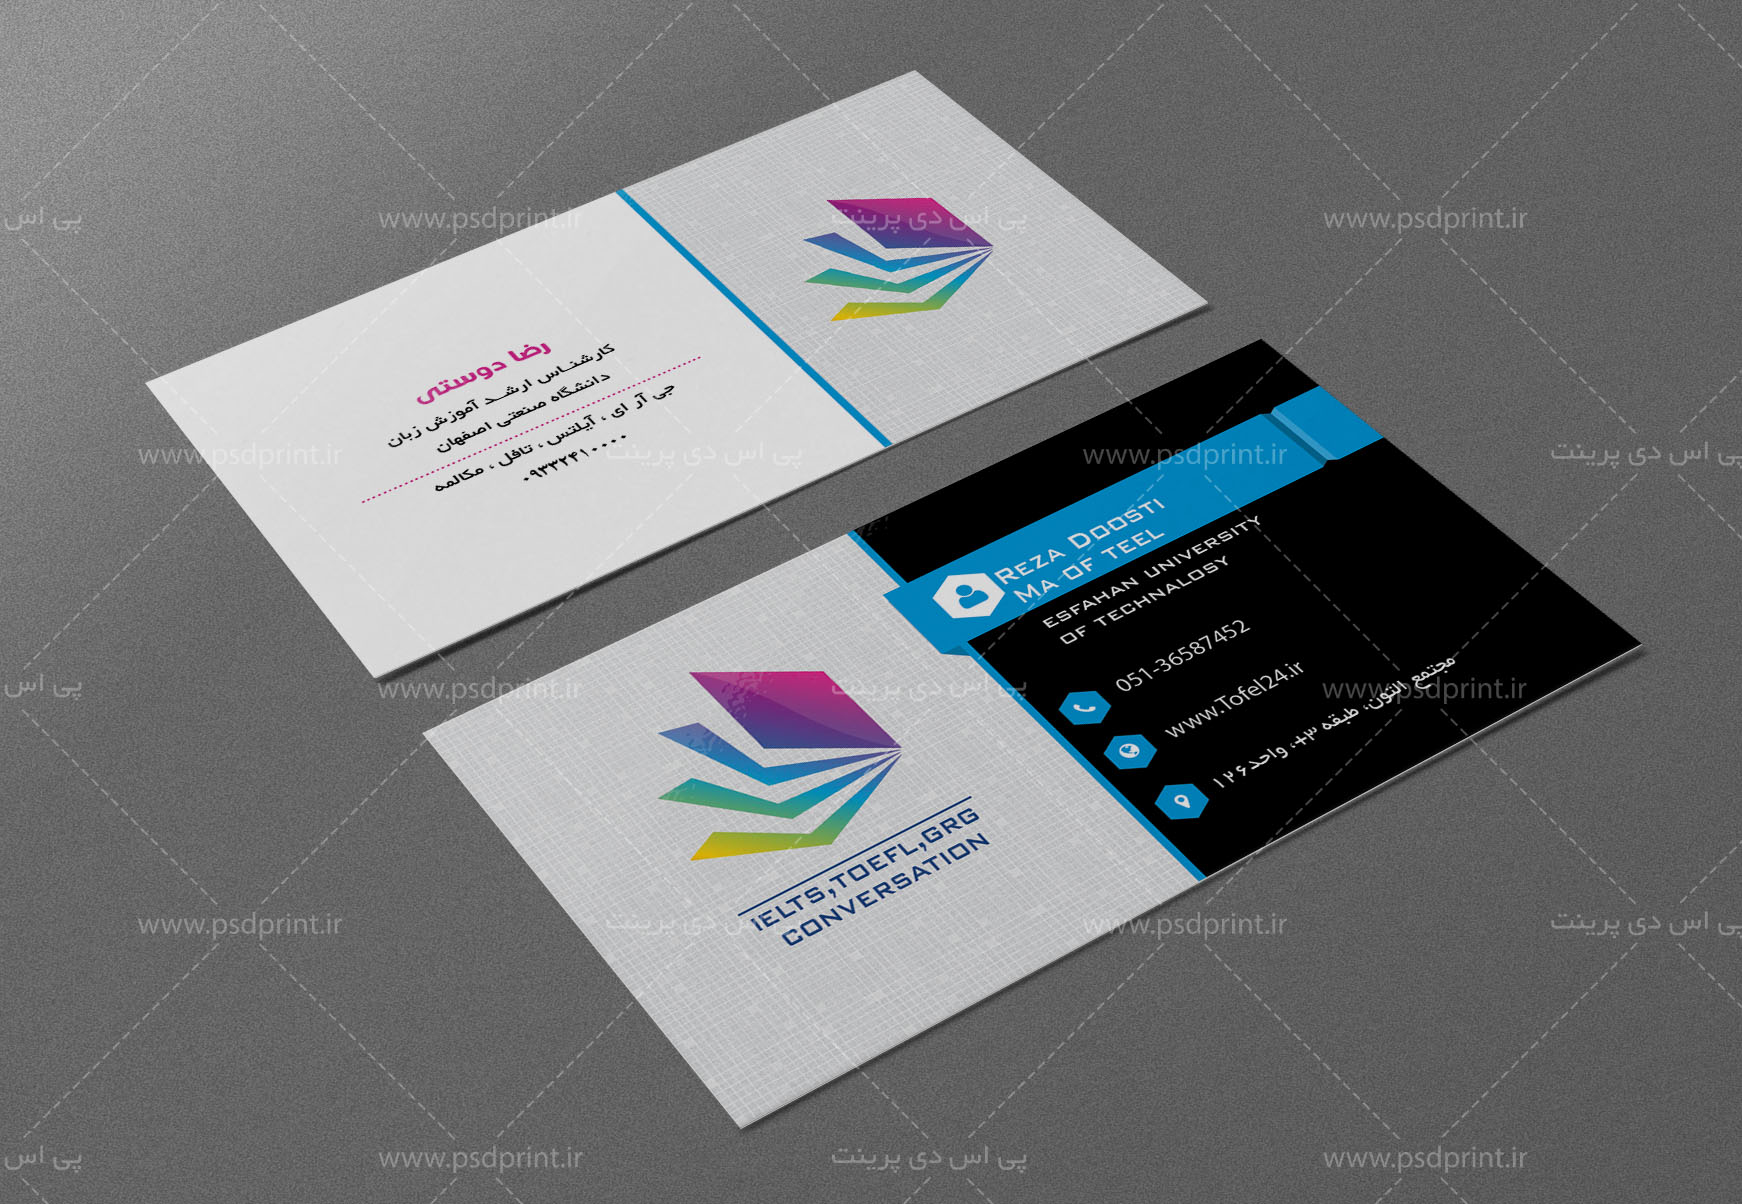 کارت ویزیت آموزش زبان انگلیسی